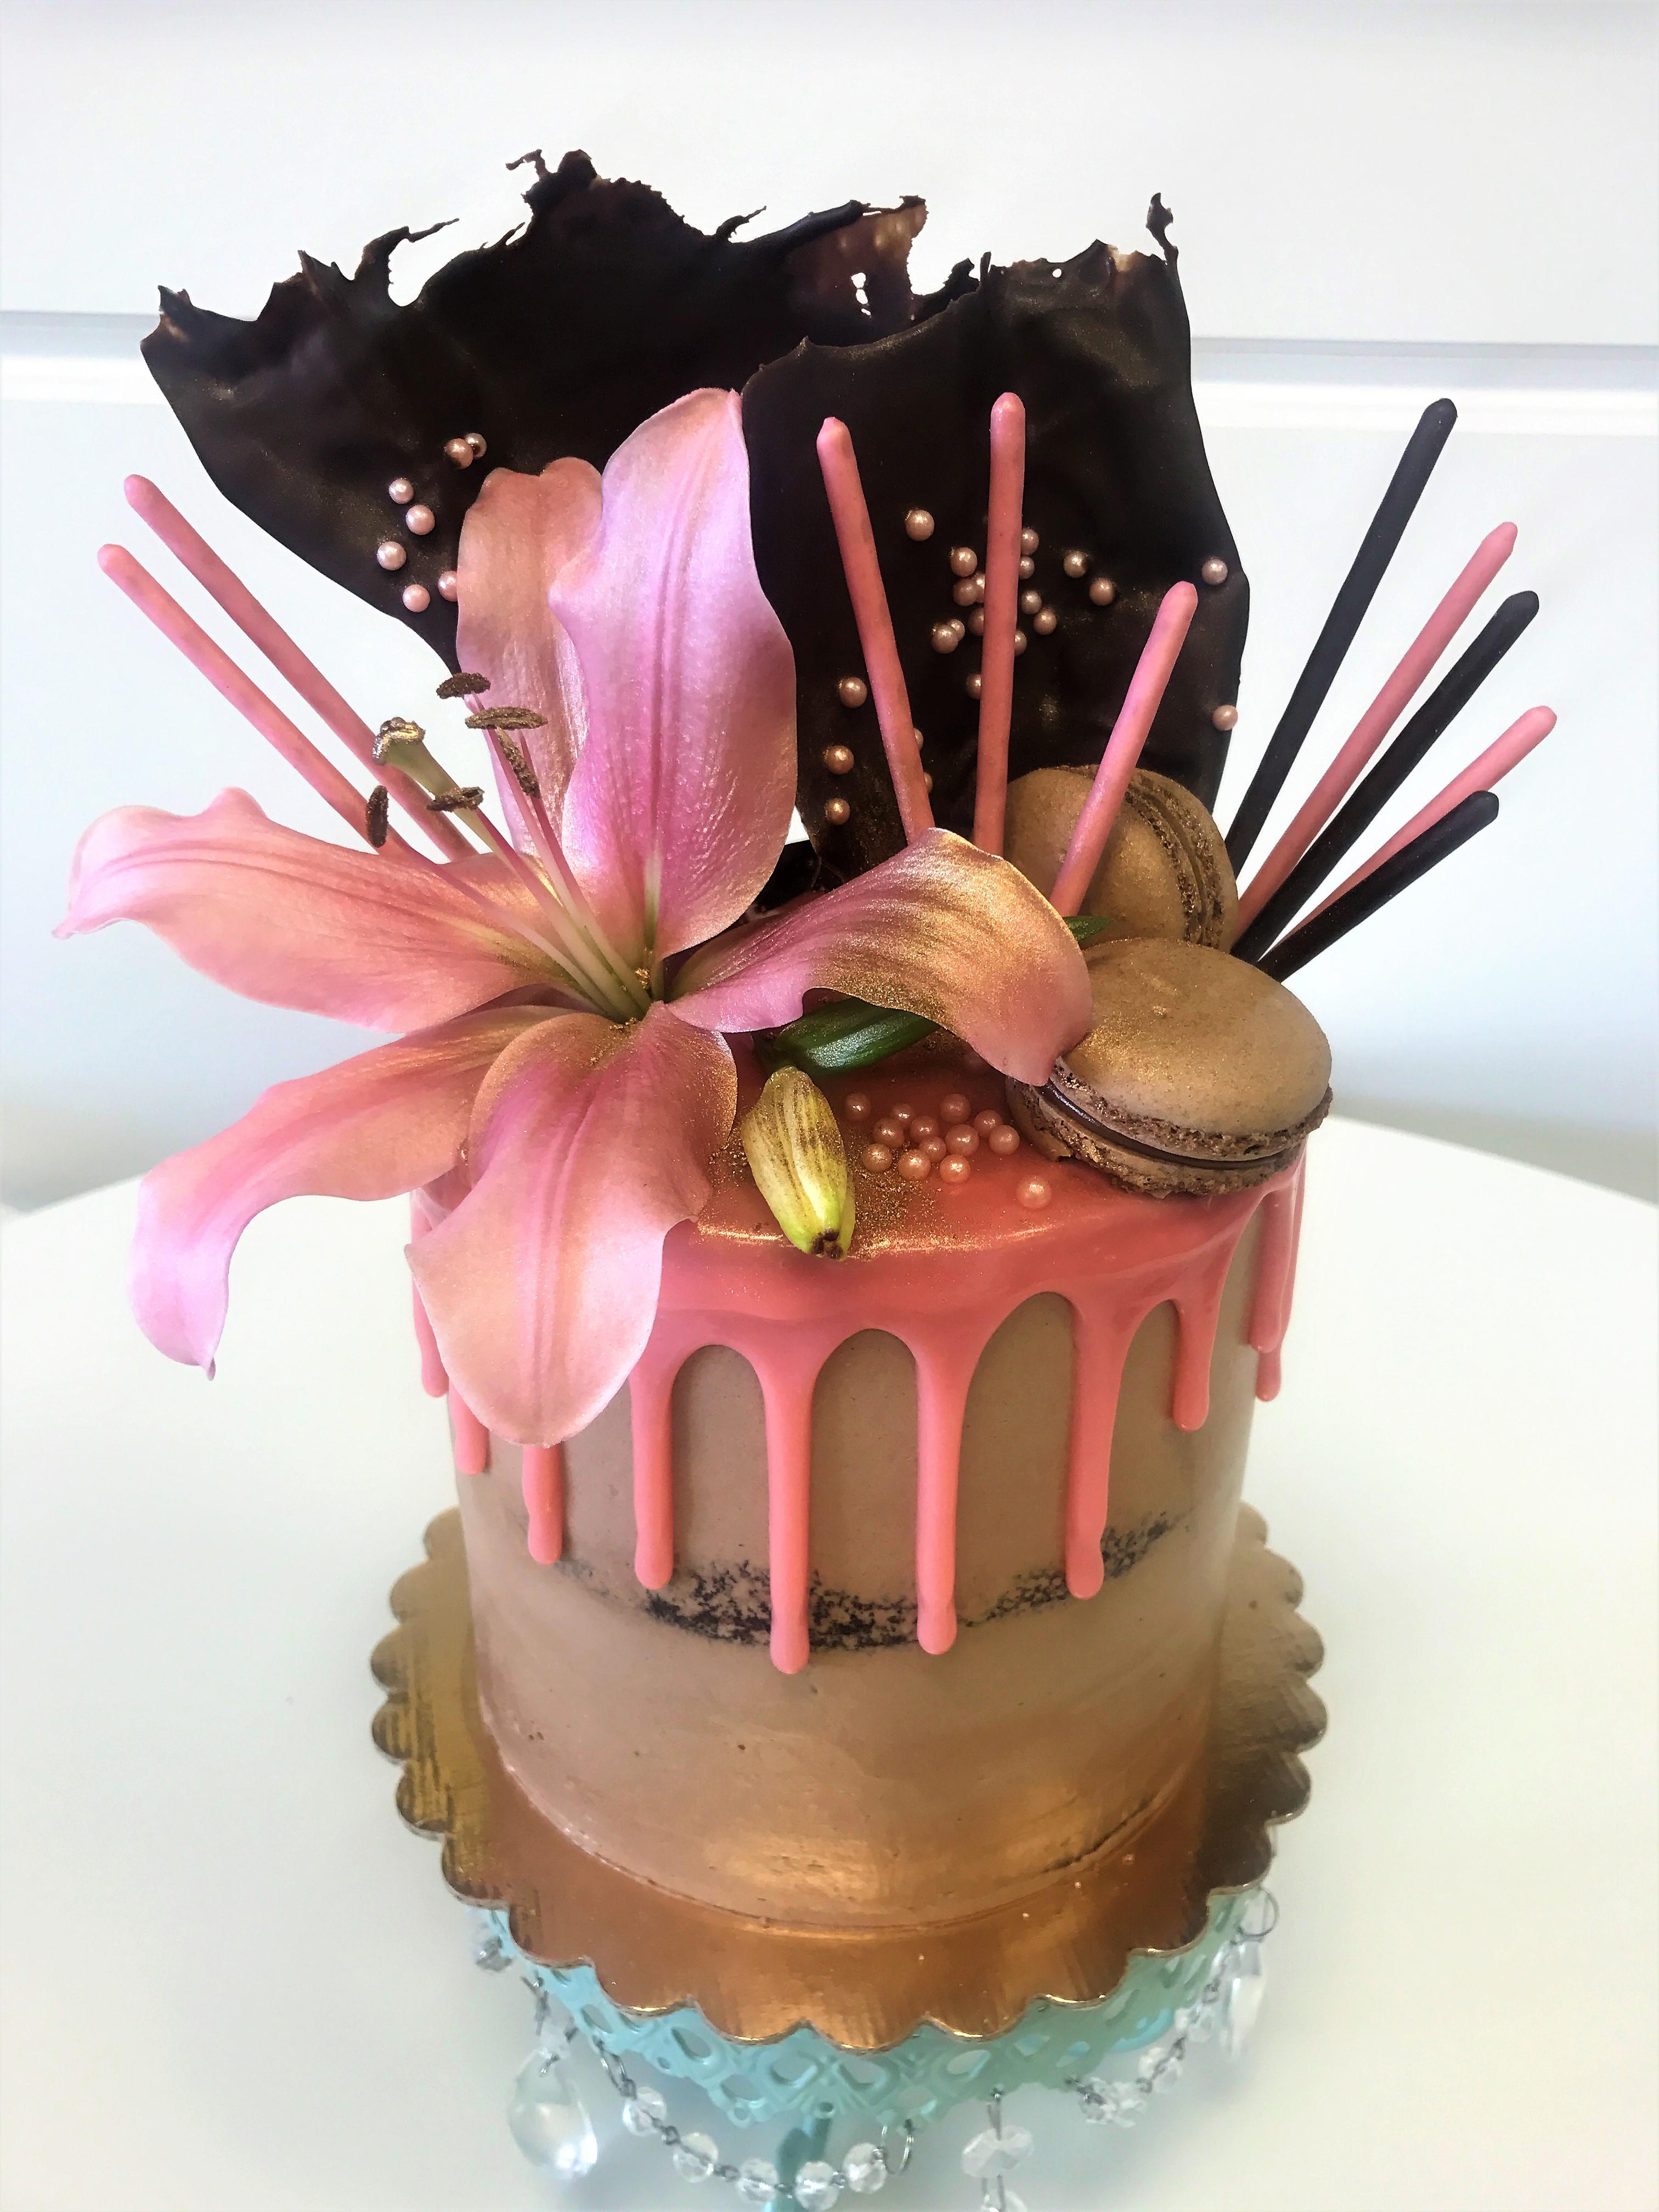 6'' ghirardelli chocolate cake